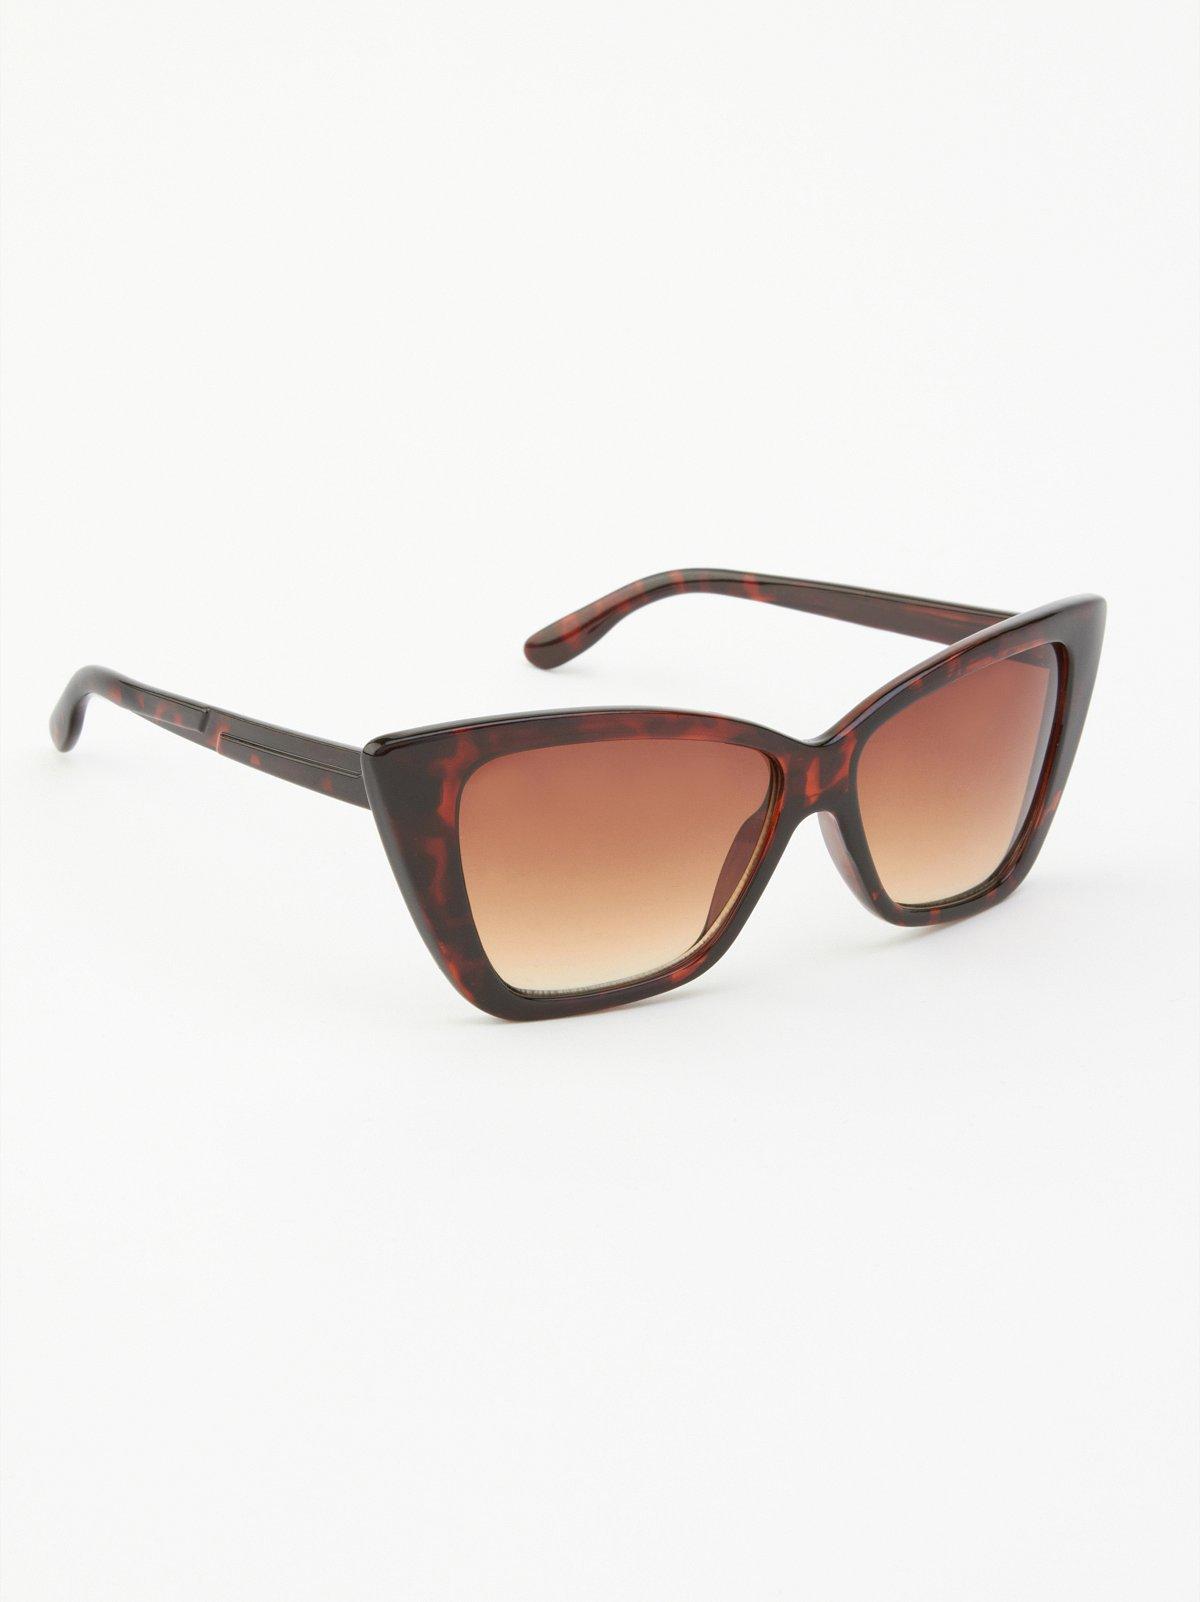 Kitten Extreme Sunglasses